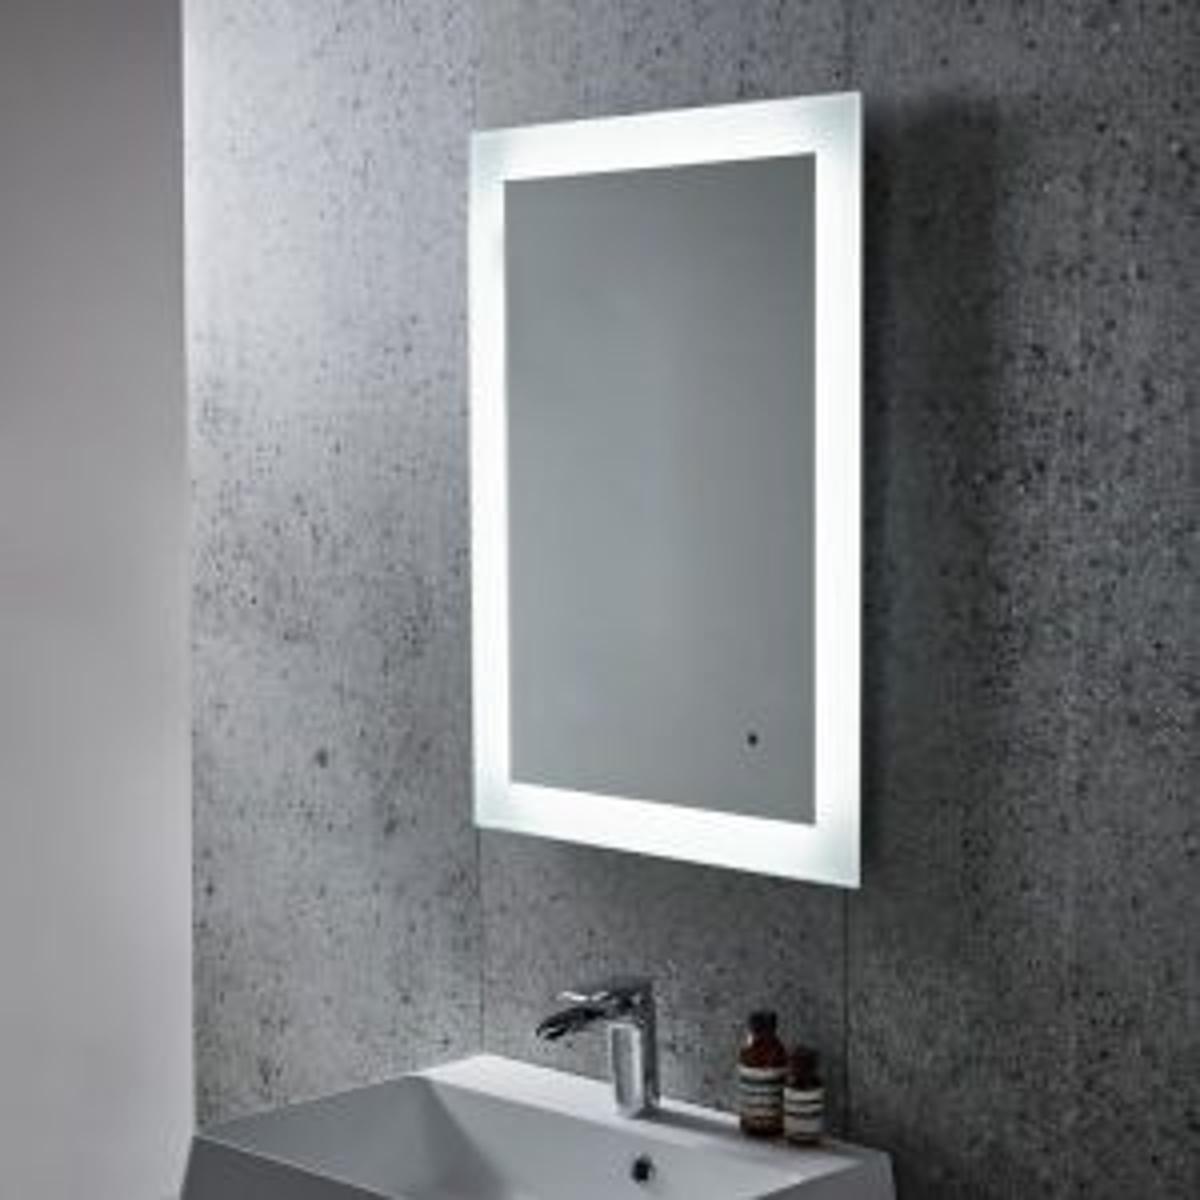 Tavistock Reform LED Backlit Illuminated Mirror - Lifestyle